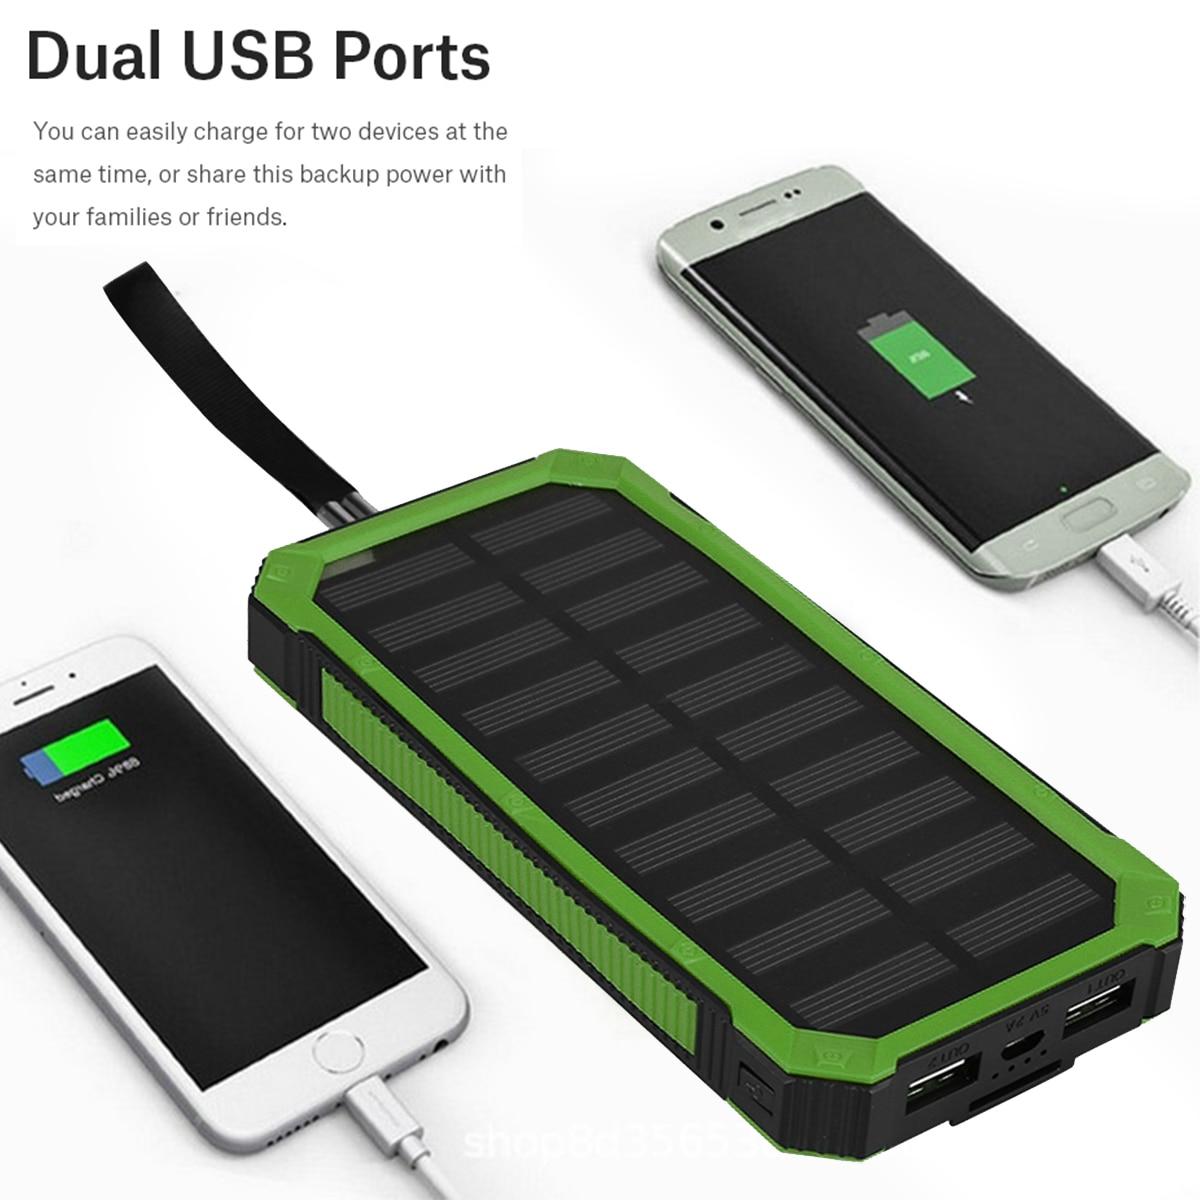 Novo curso portátil caso banco de energia solar kit diy 20000mah carregamento rápido duplo usb móvel power bank casos embutido painel solar